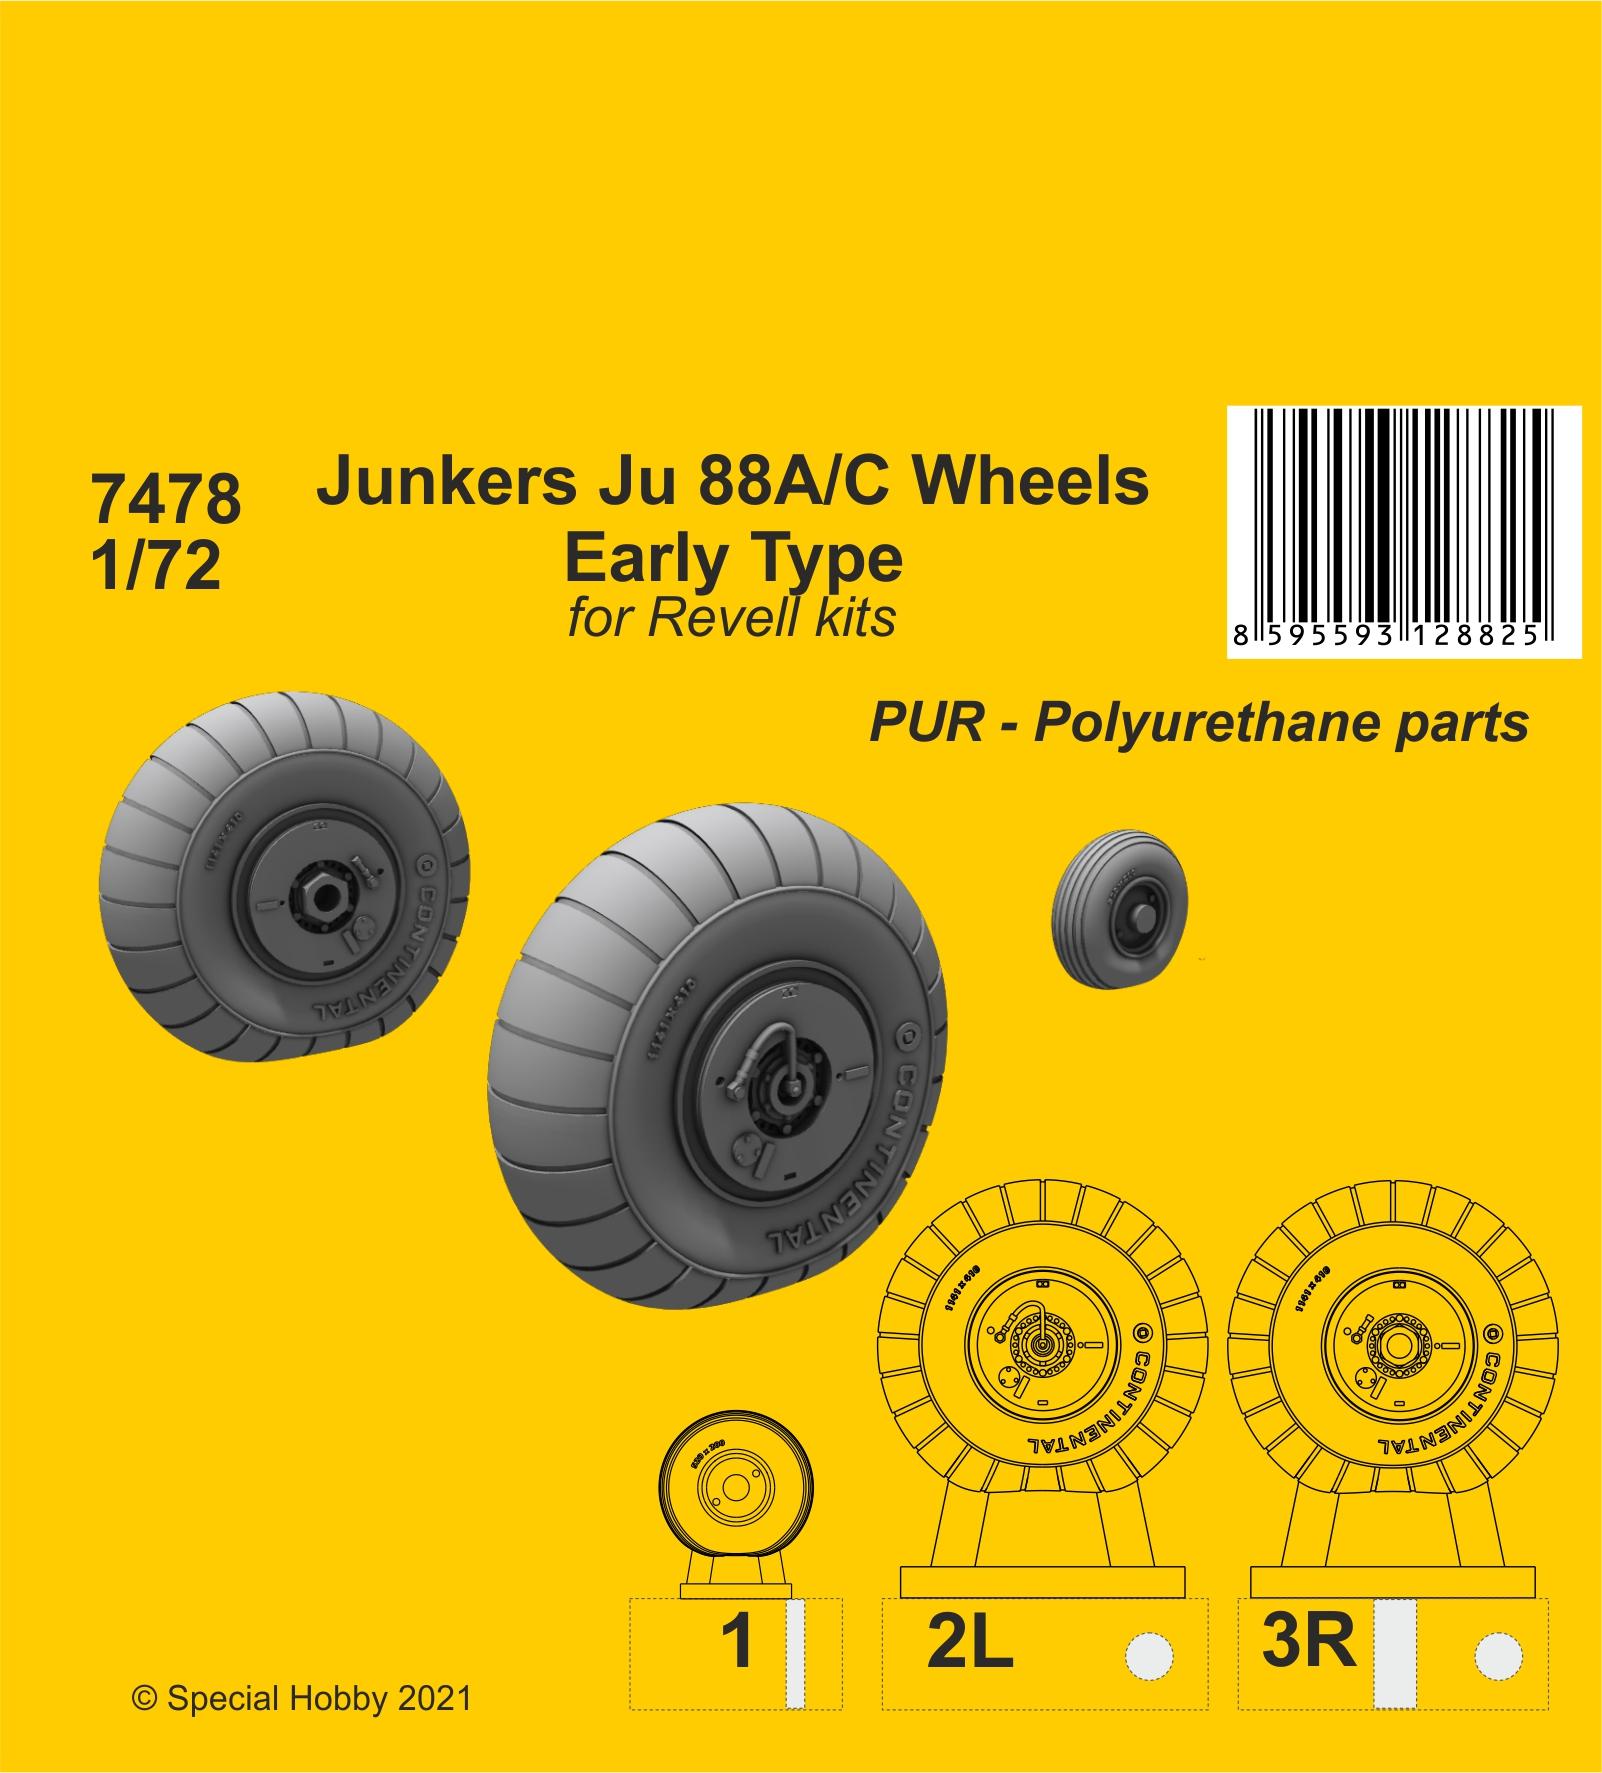 CMK 1/72 Junkers Ju 88A/C Wheels Early Type (Revell kits)